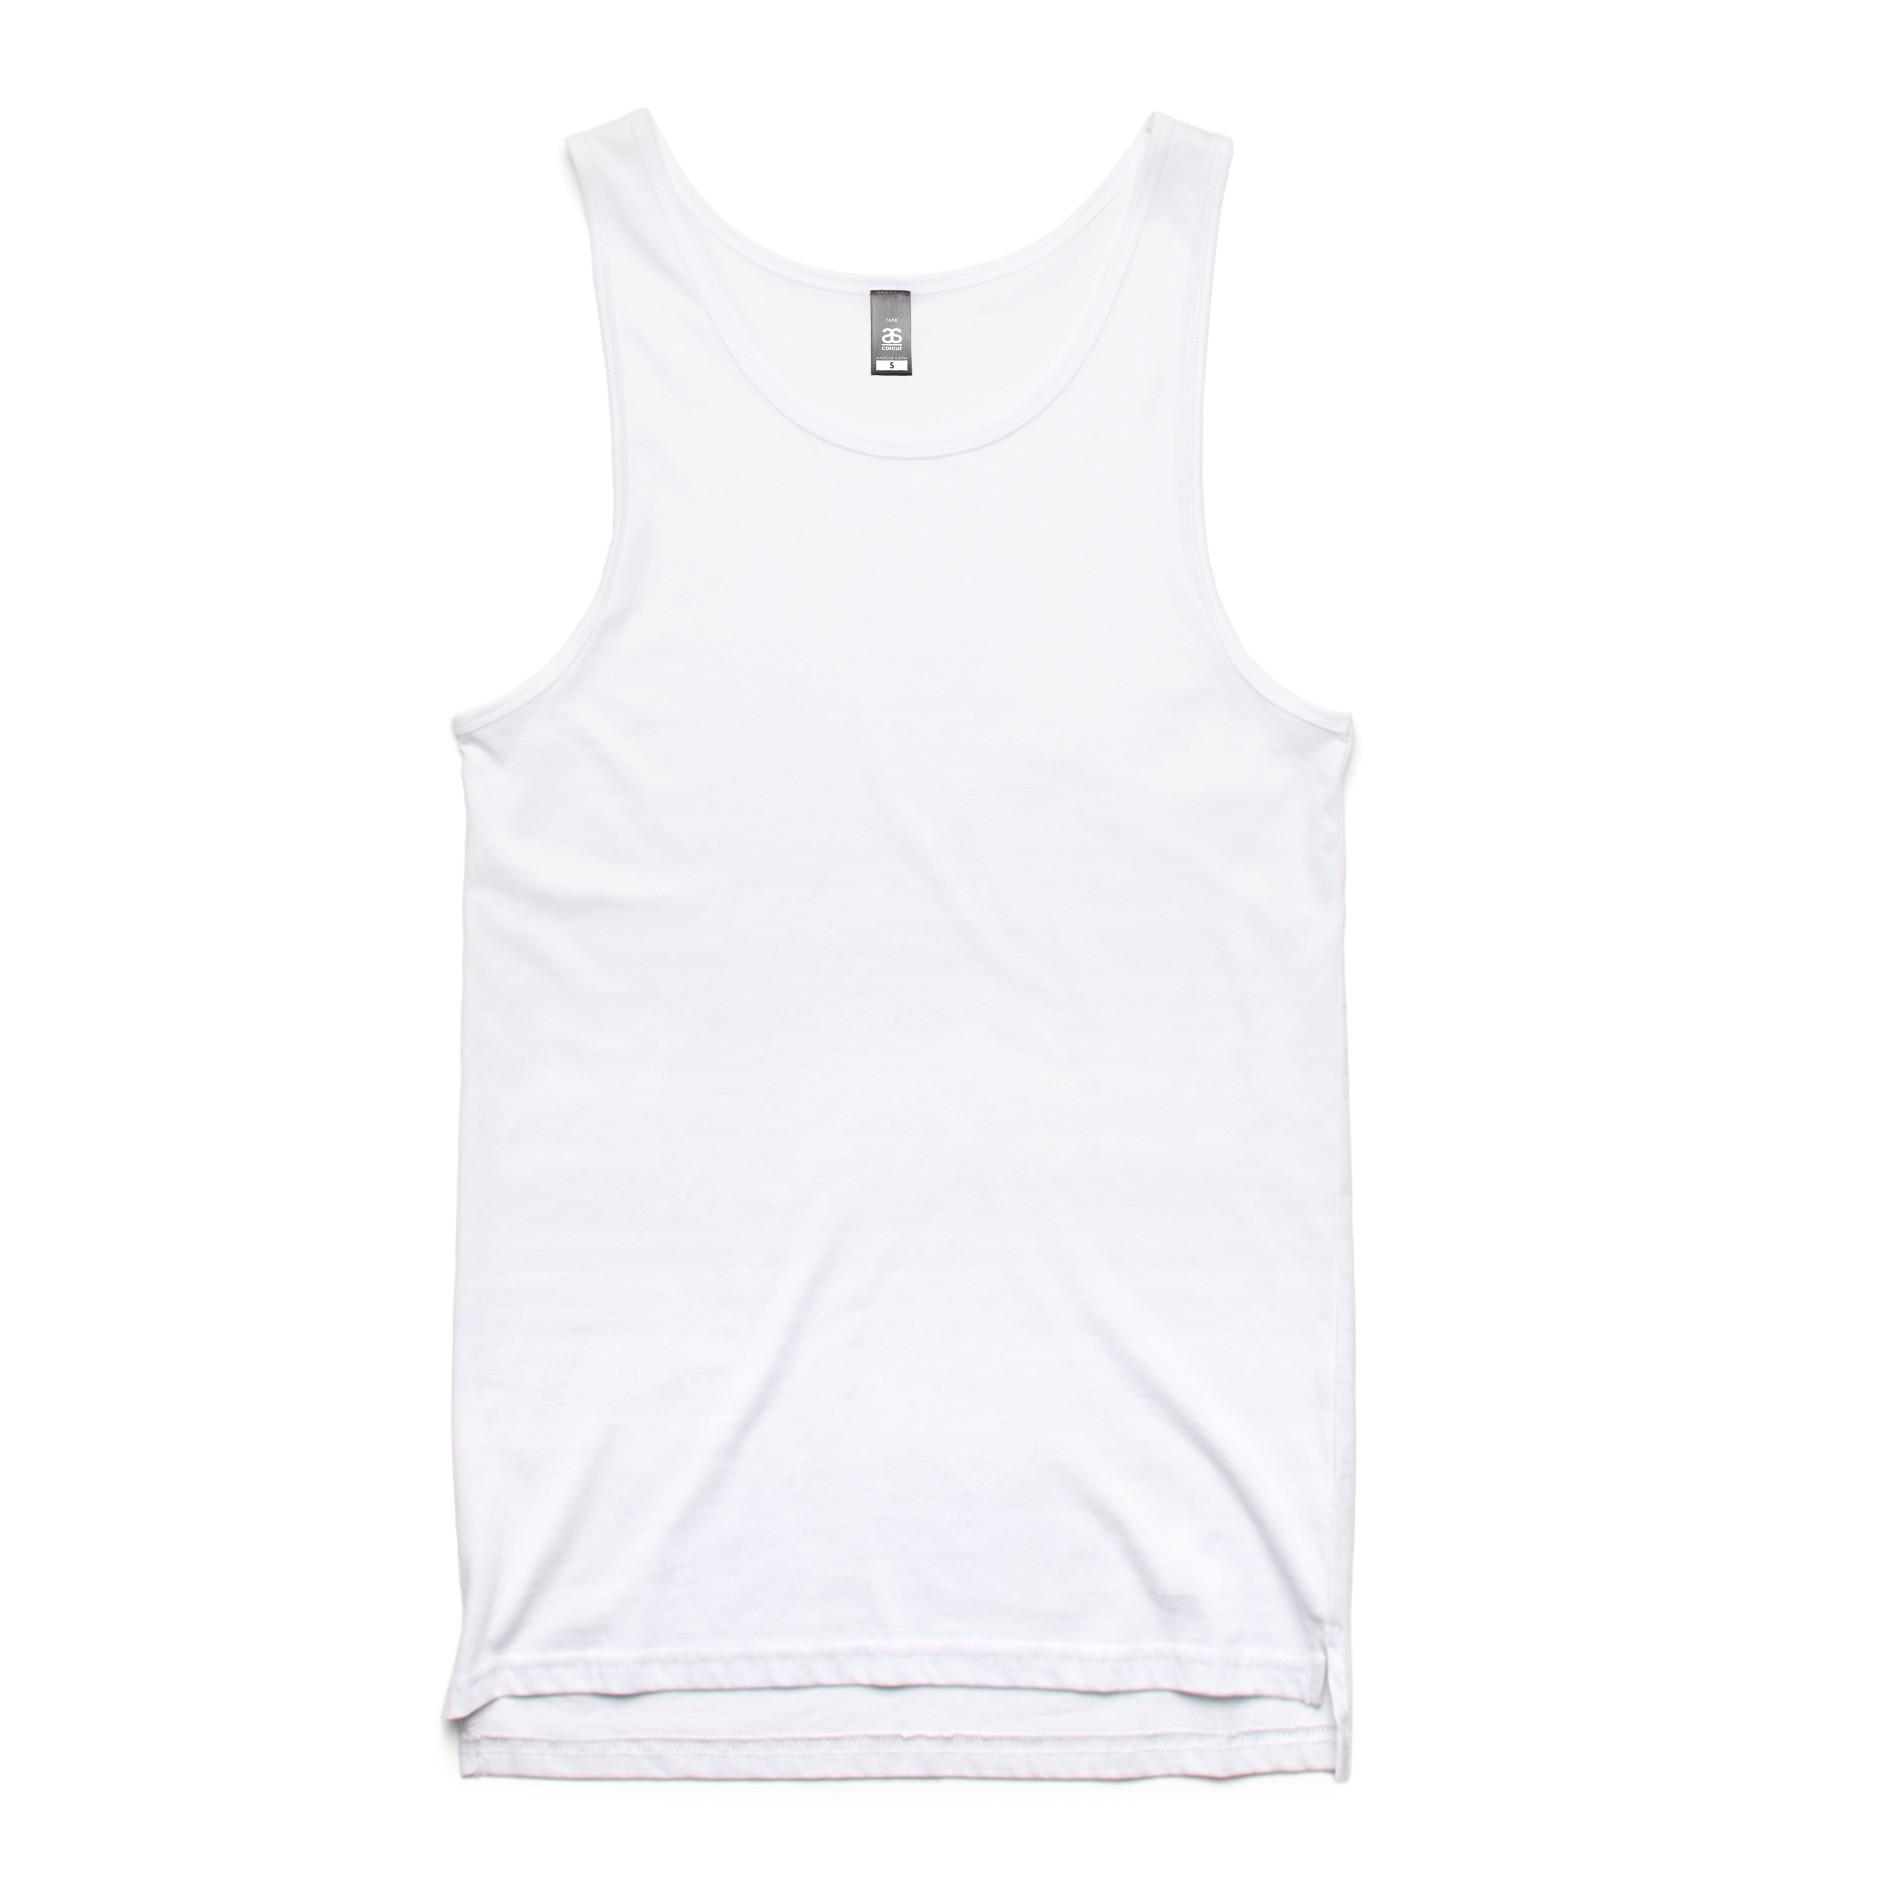 Design your t shirt nz - Mens Typo Singlet T Shirt Printing Nz Design Your Own Custom Shirt New Zealand